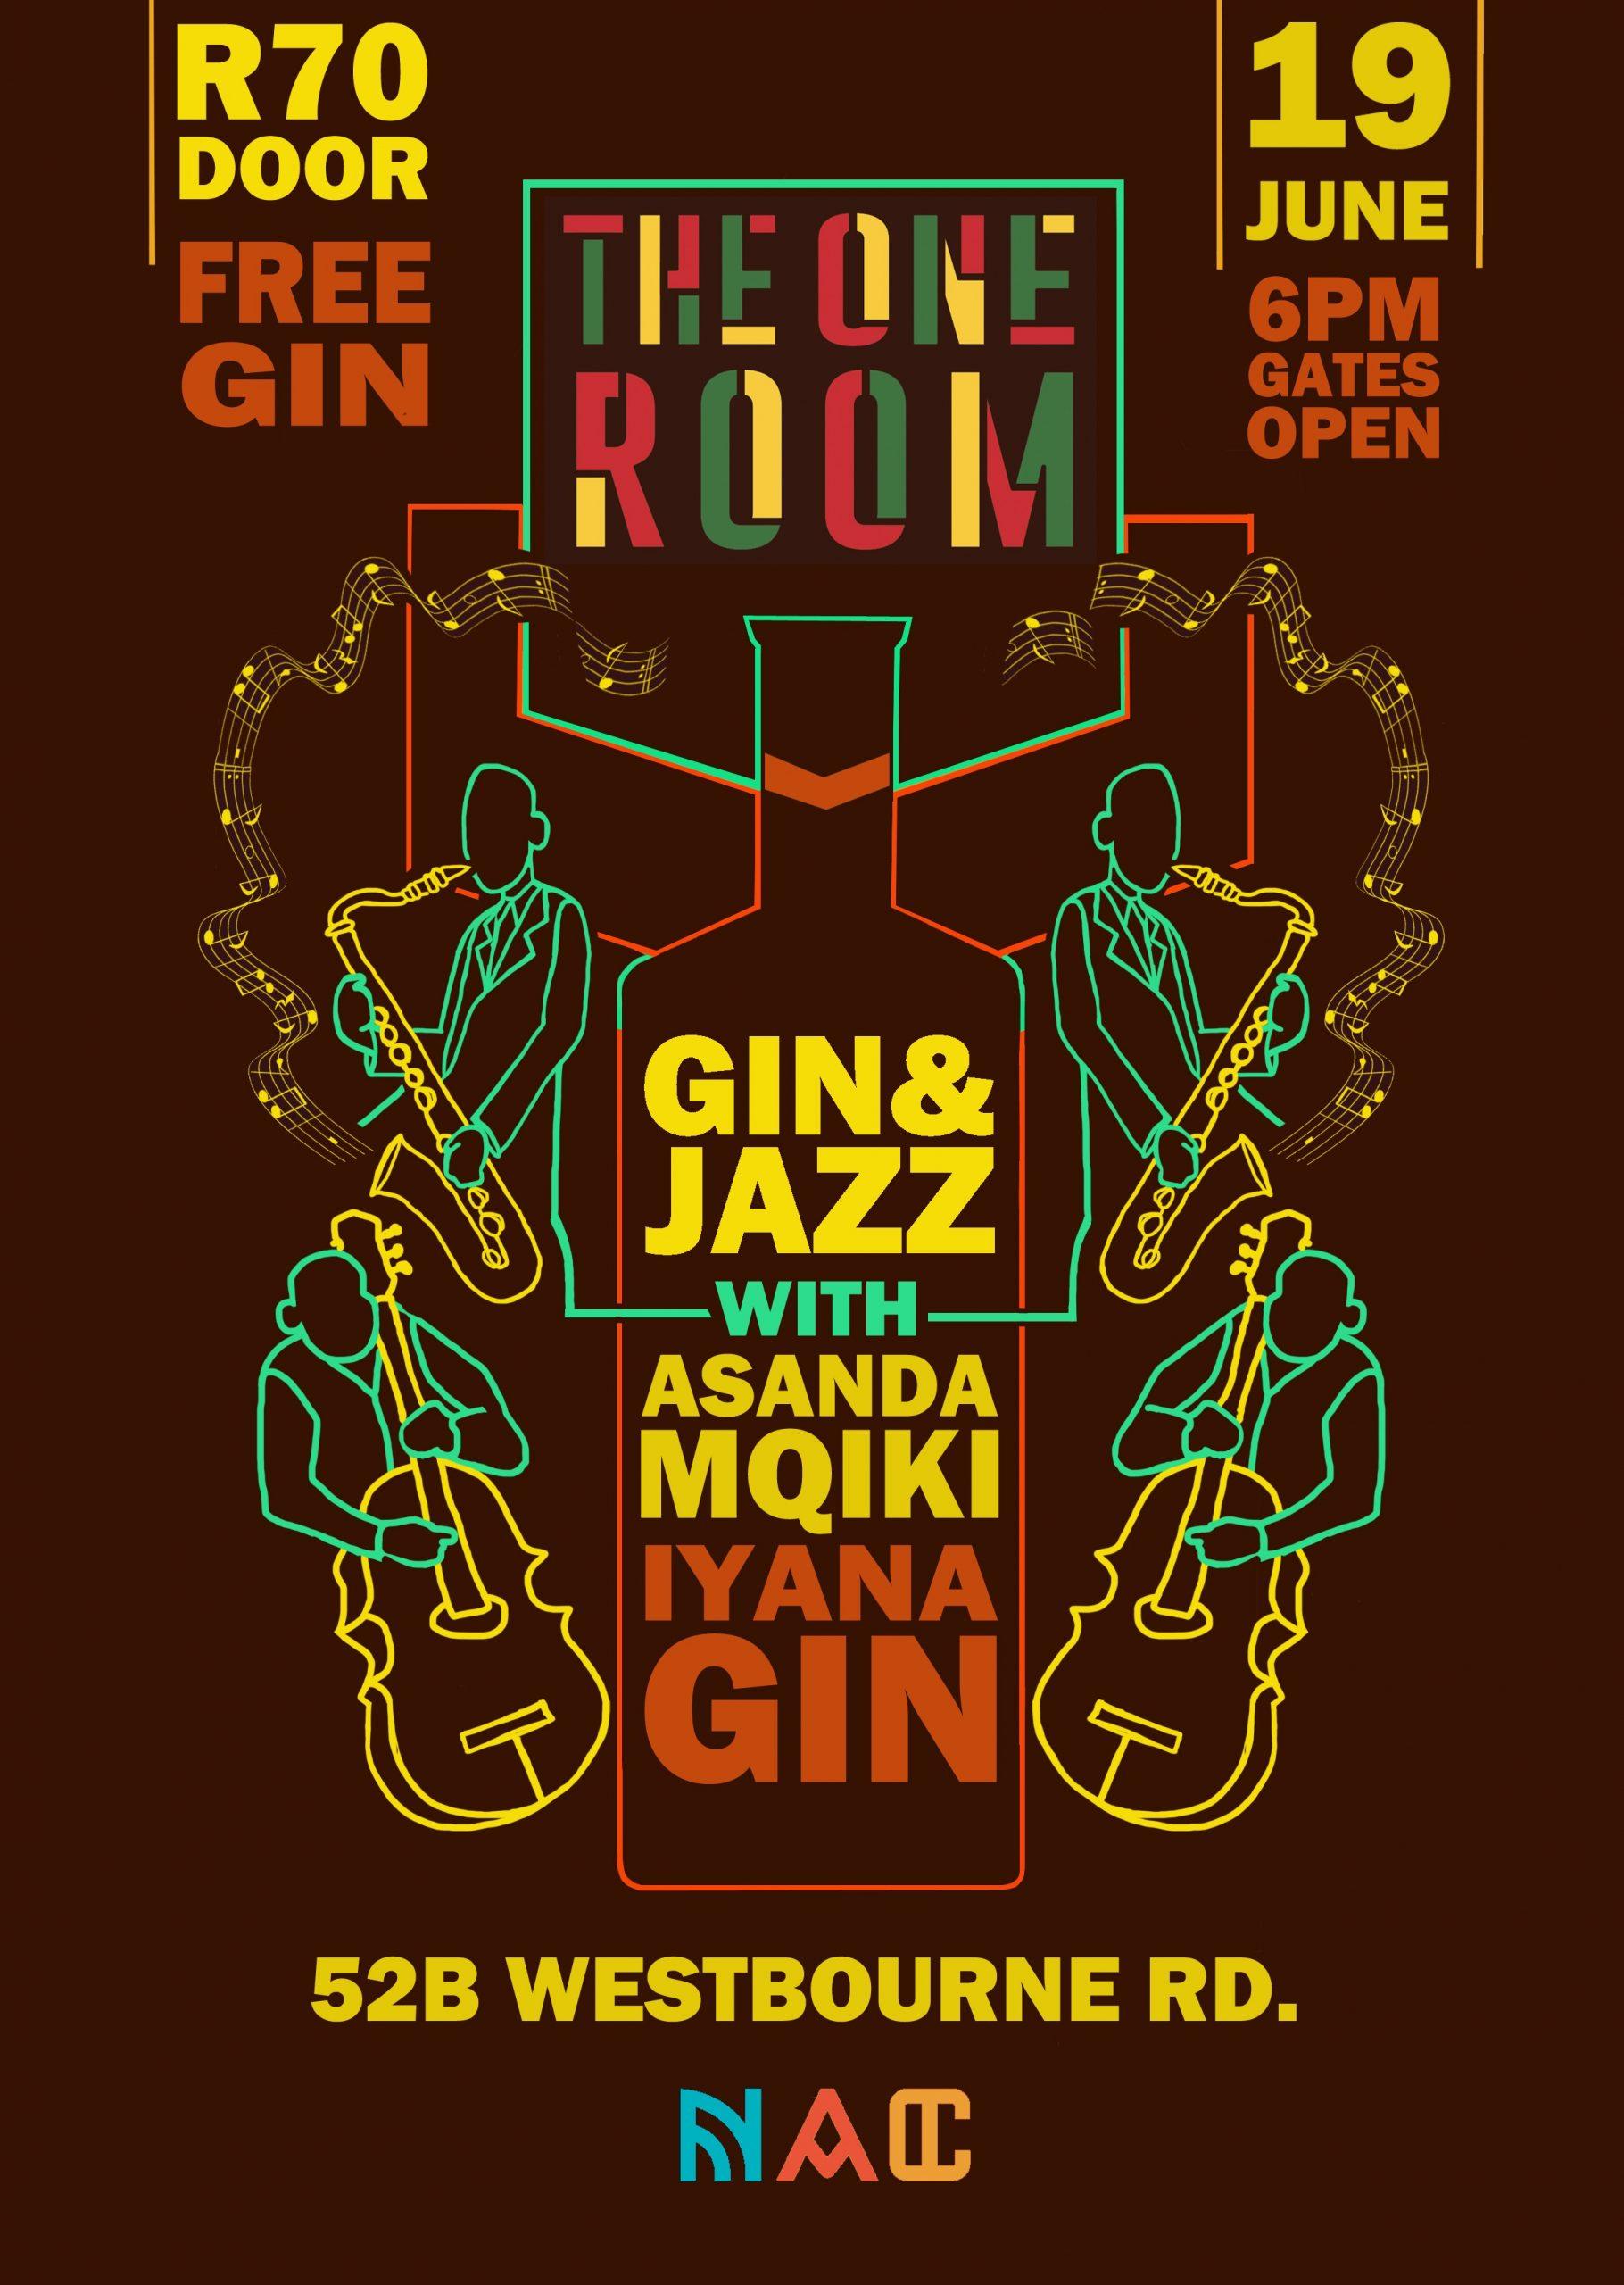 Gin & Jazz with Asanda Mqiki